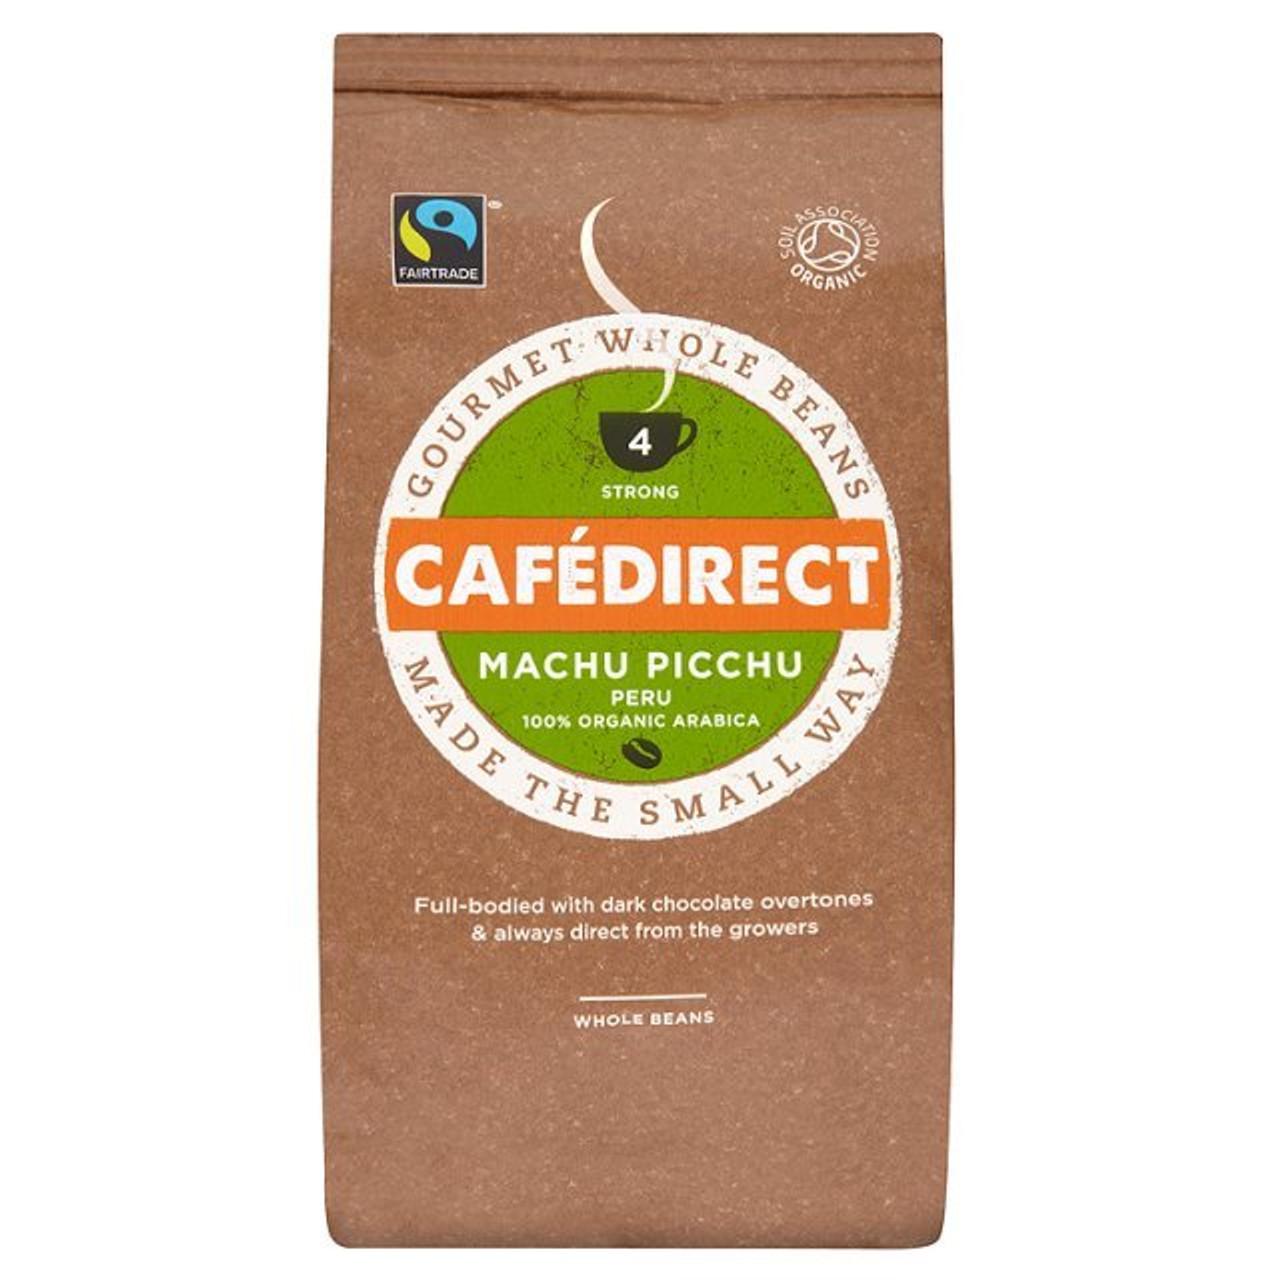 Cafedirect Machu Picchu Coffee Beans 227g - Caletoni